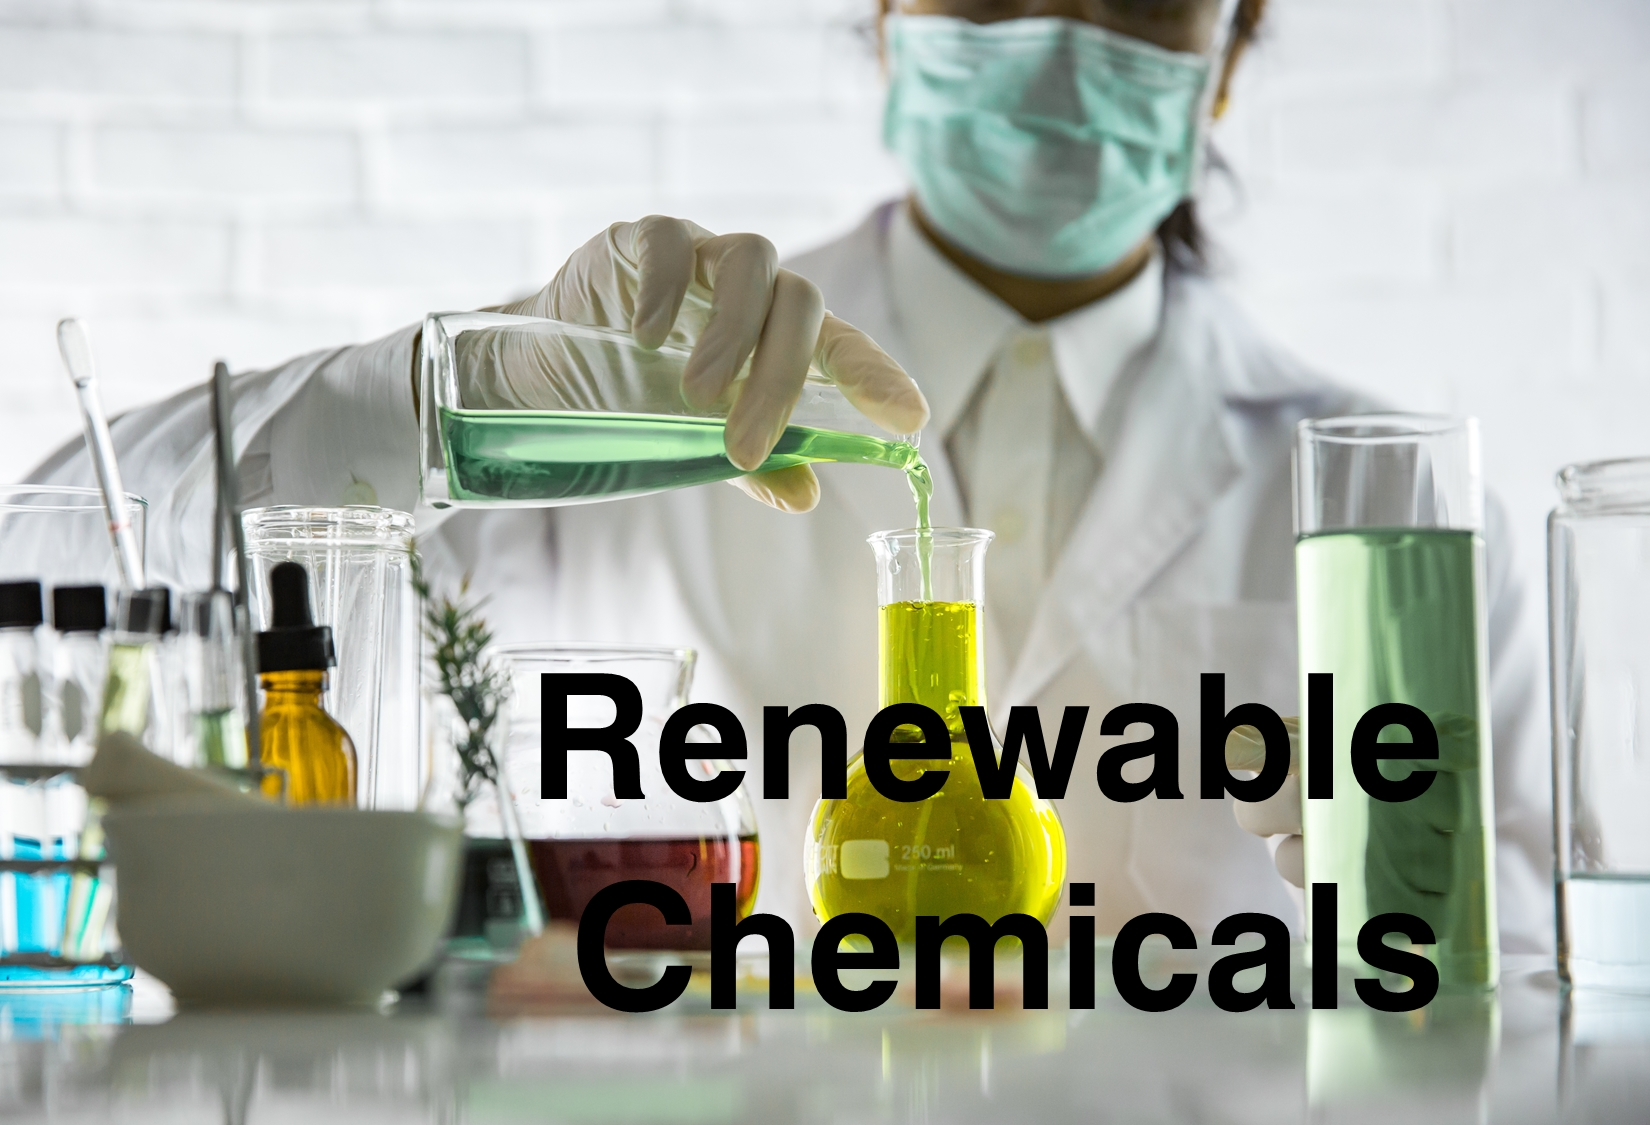 Renewable Chemicals